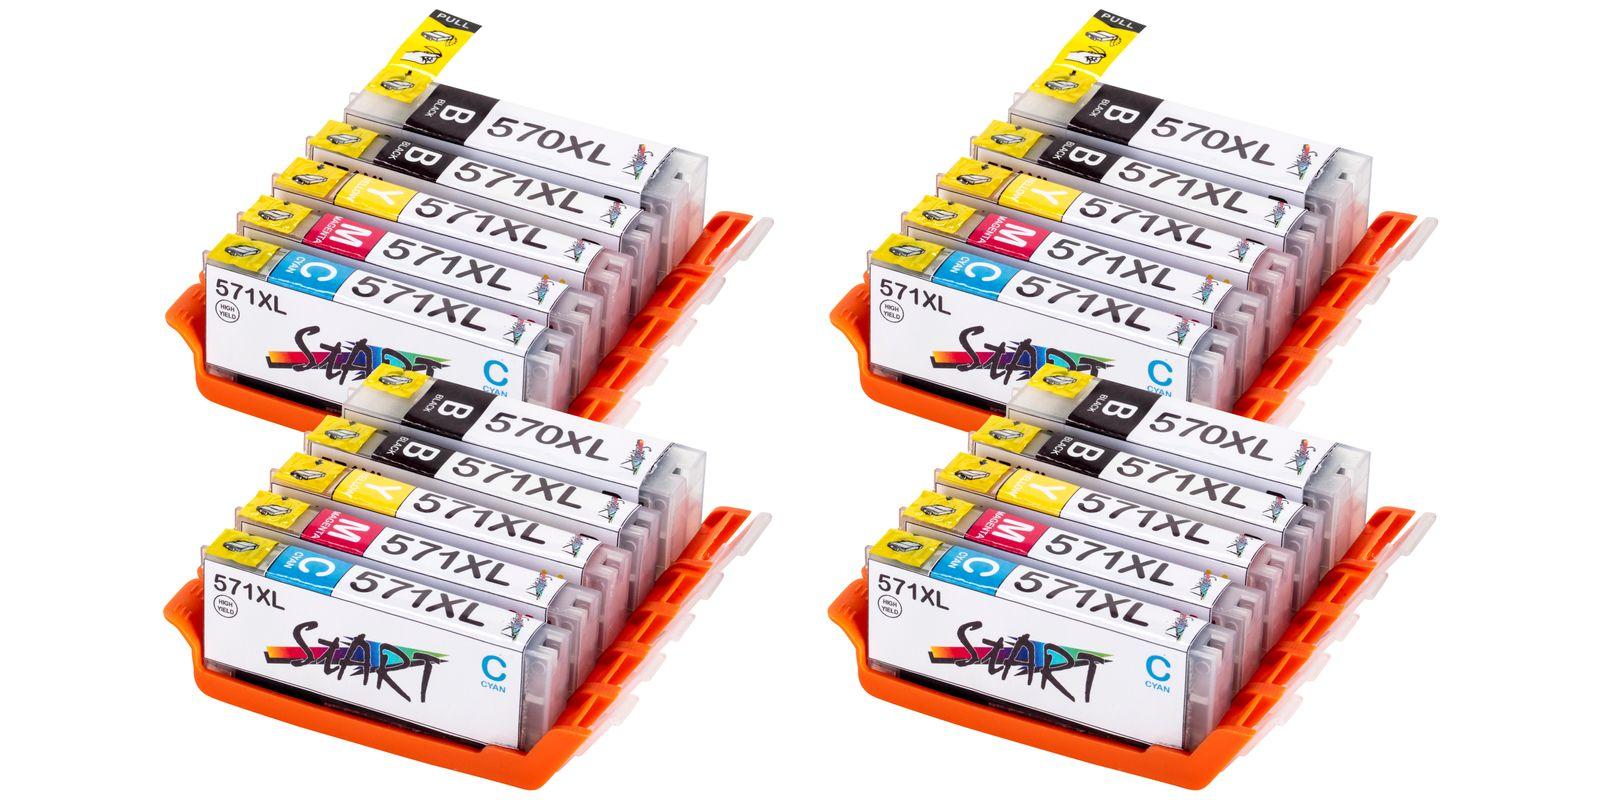 20 Compatible Ink Cartridges to Canon PGI-570 / CLI-571  (BK, PHBK, C, M, Y) XL